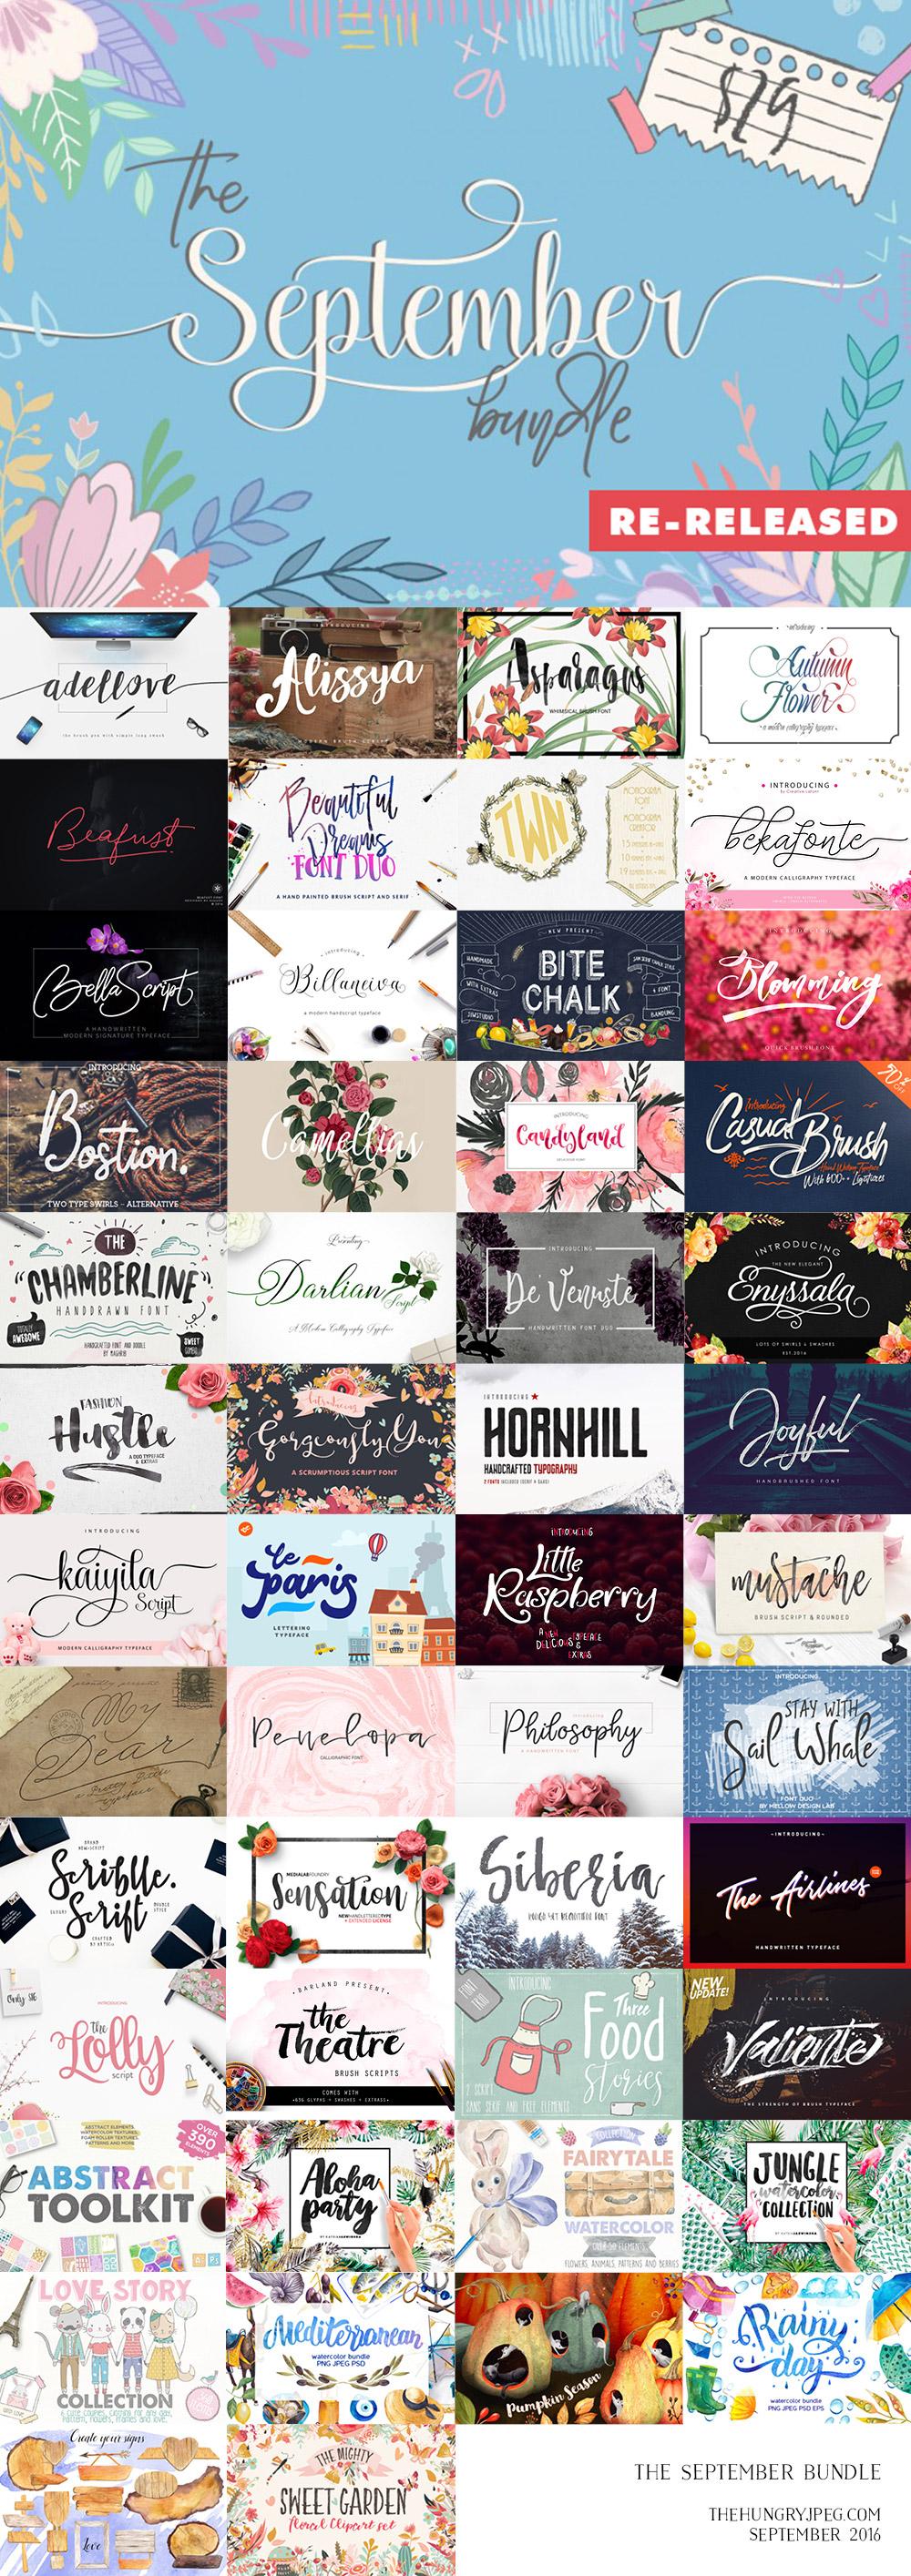 The September Fonts & Graphics Bundle